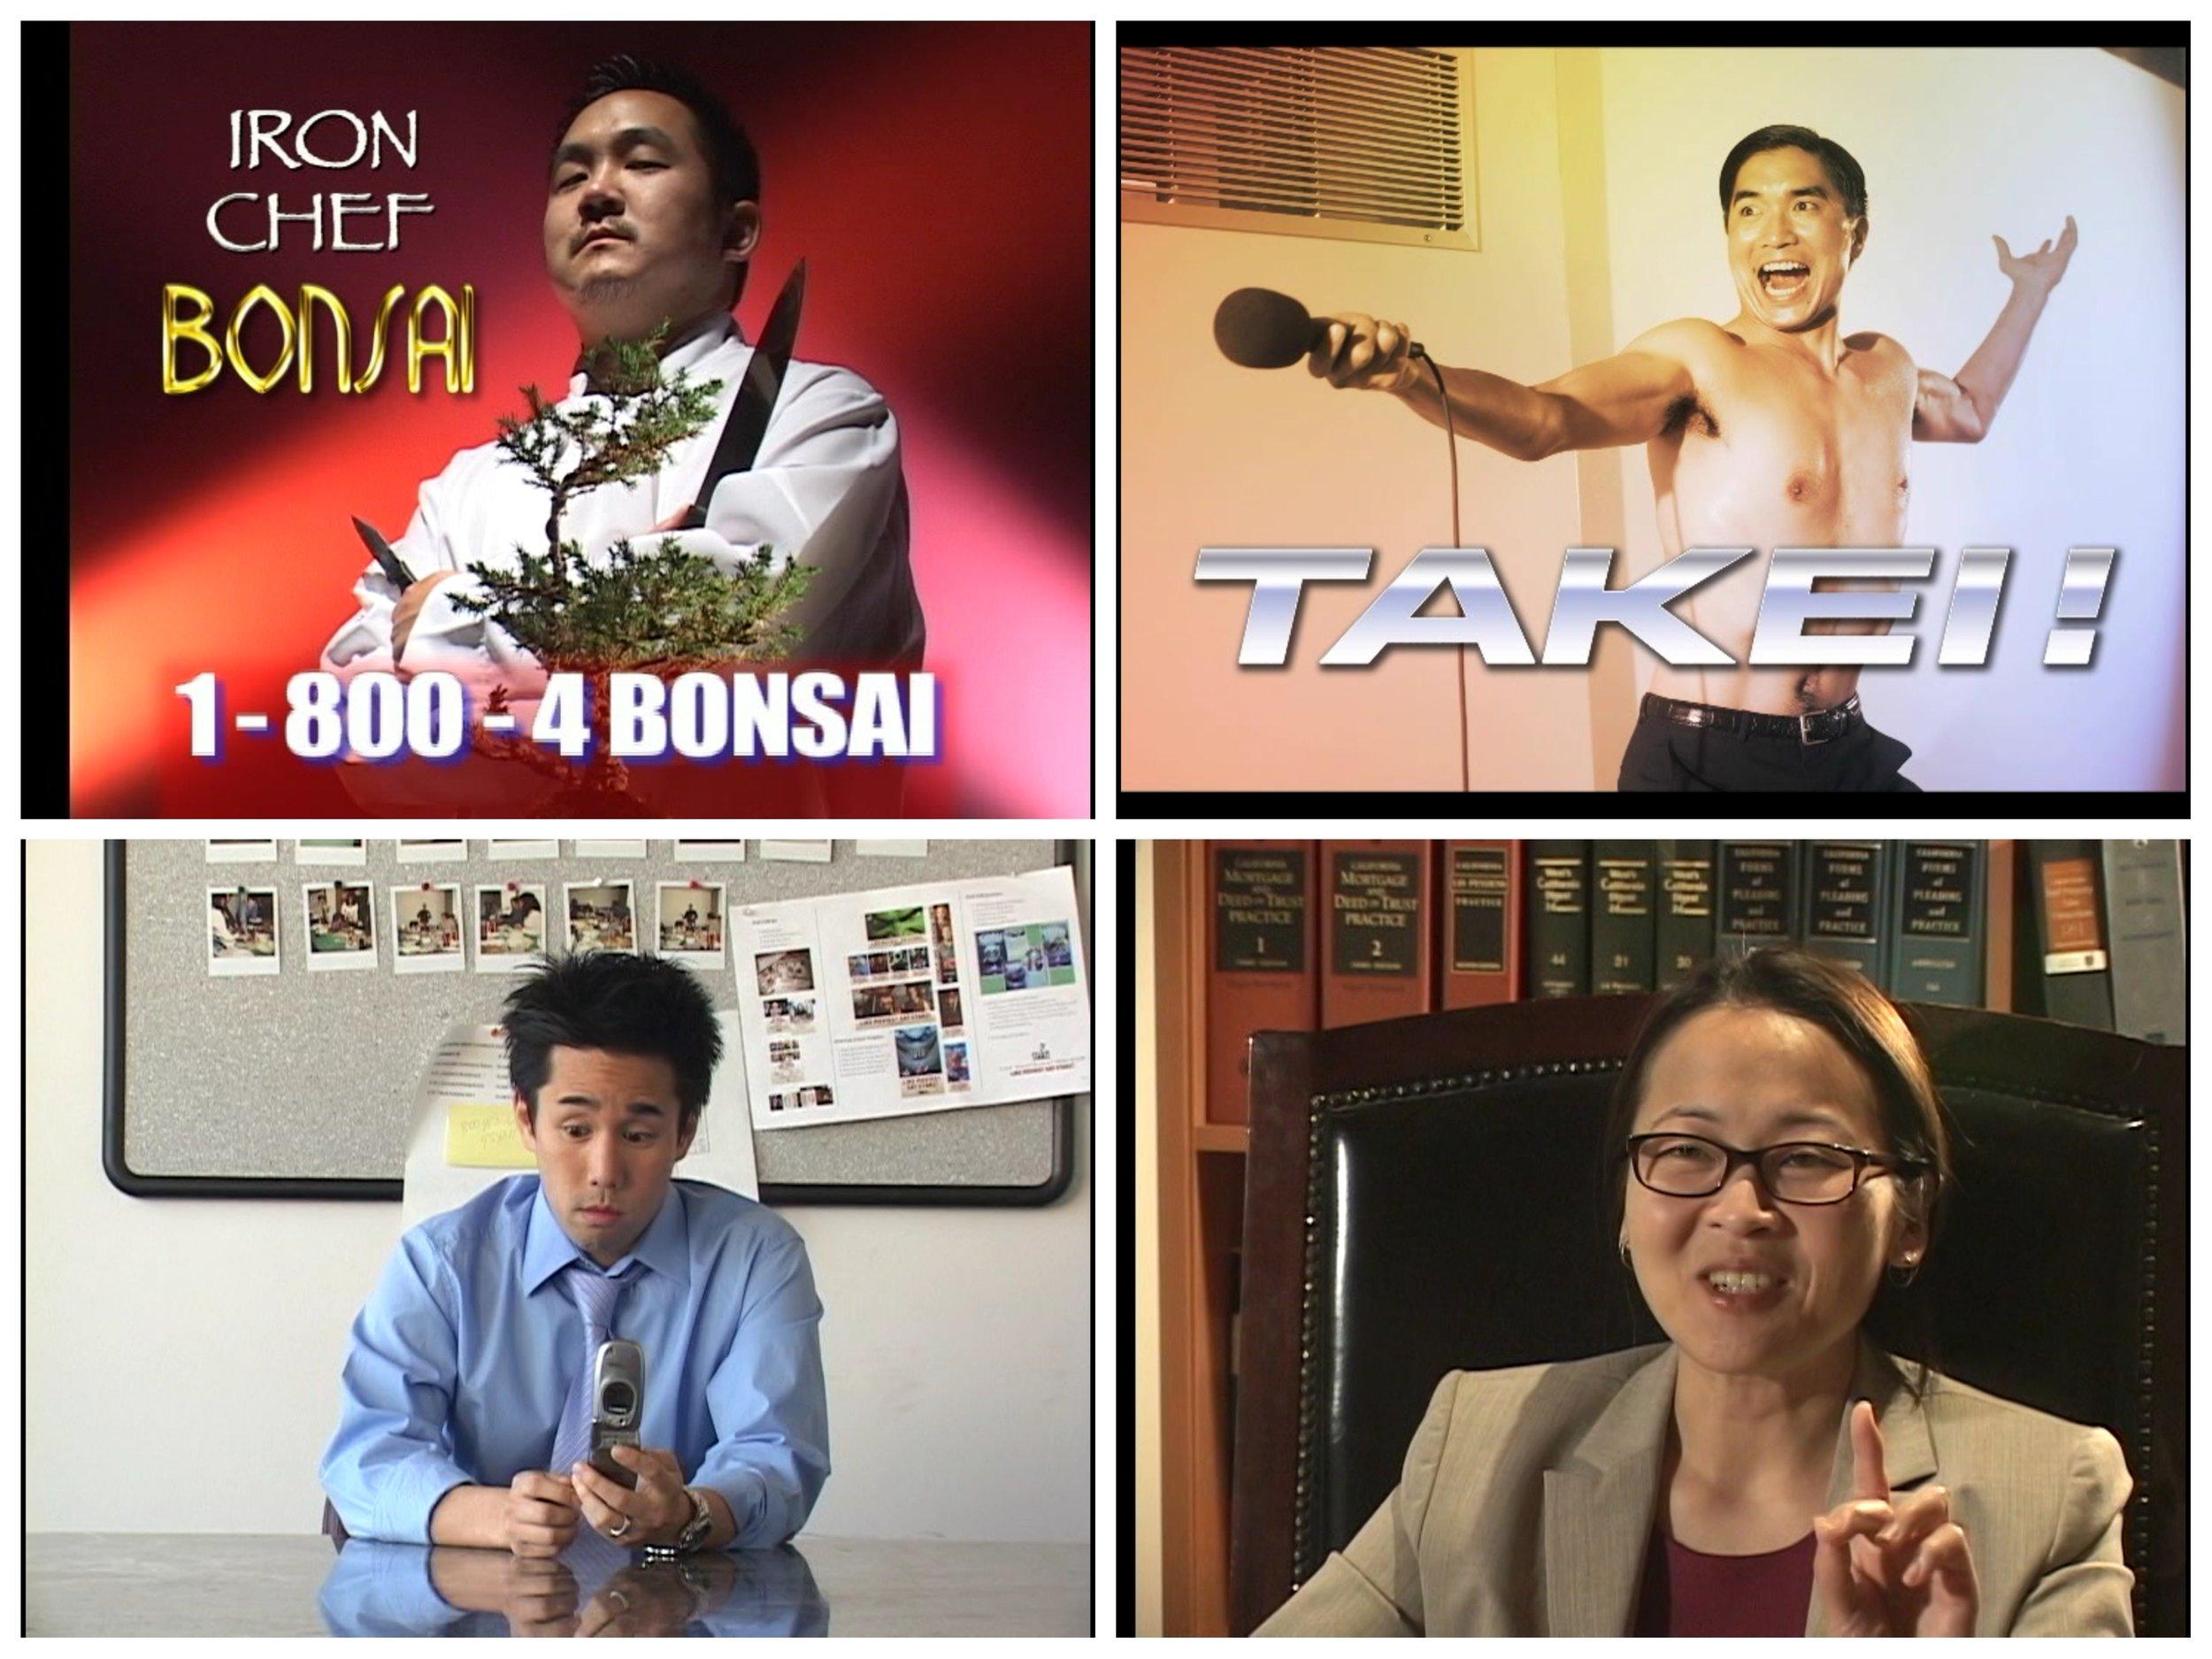 Cast members: Aaron Takahashi, Greg Watanabe, Perry Shen, Suzy Nakamura